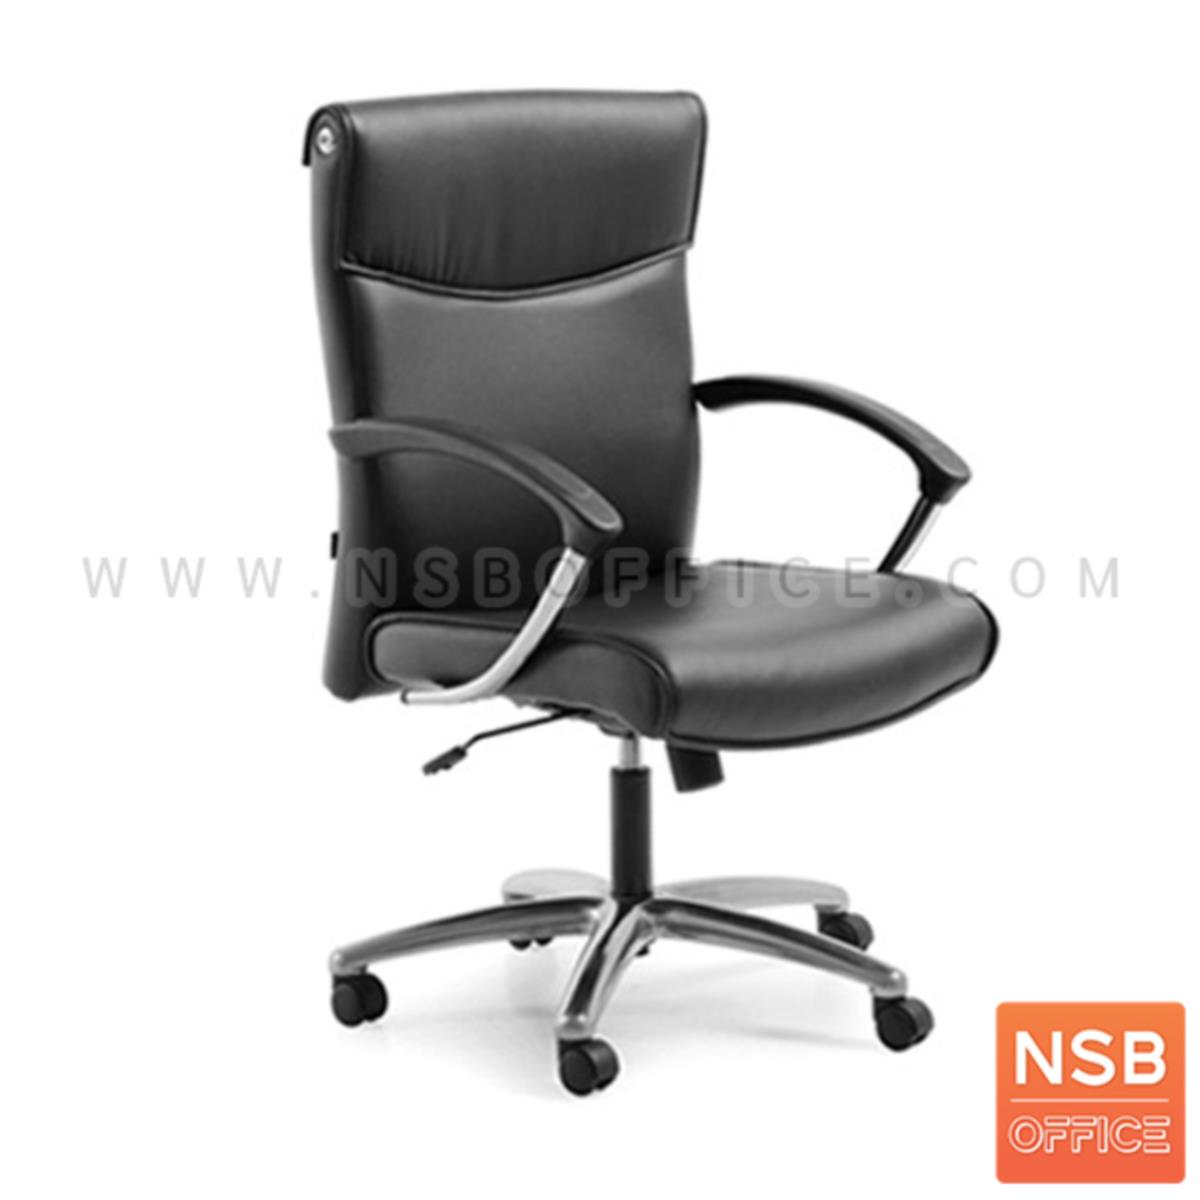 B26A147:เก้าอี้สำนักงาน รุ่น Floyd (ฟลอยด์)  โช๊คแก๊ส ก้อนโยก ขาอลูมิเนียม